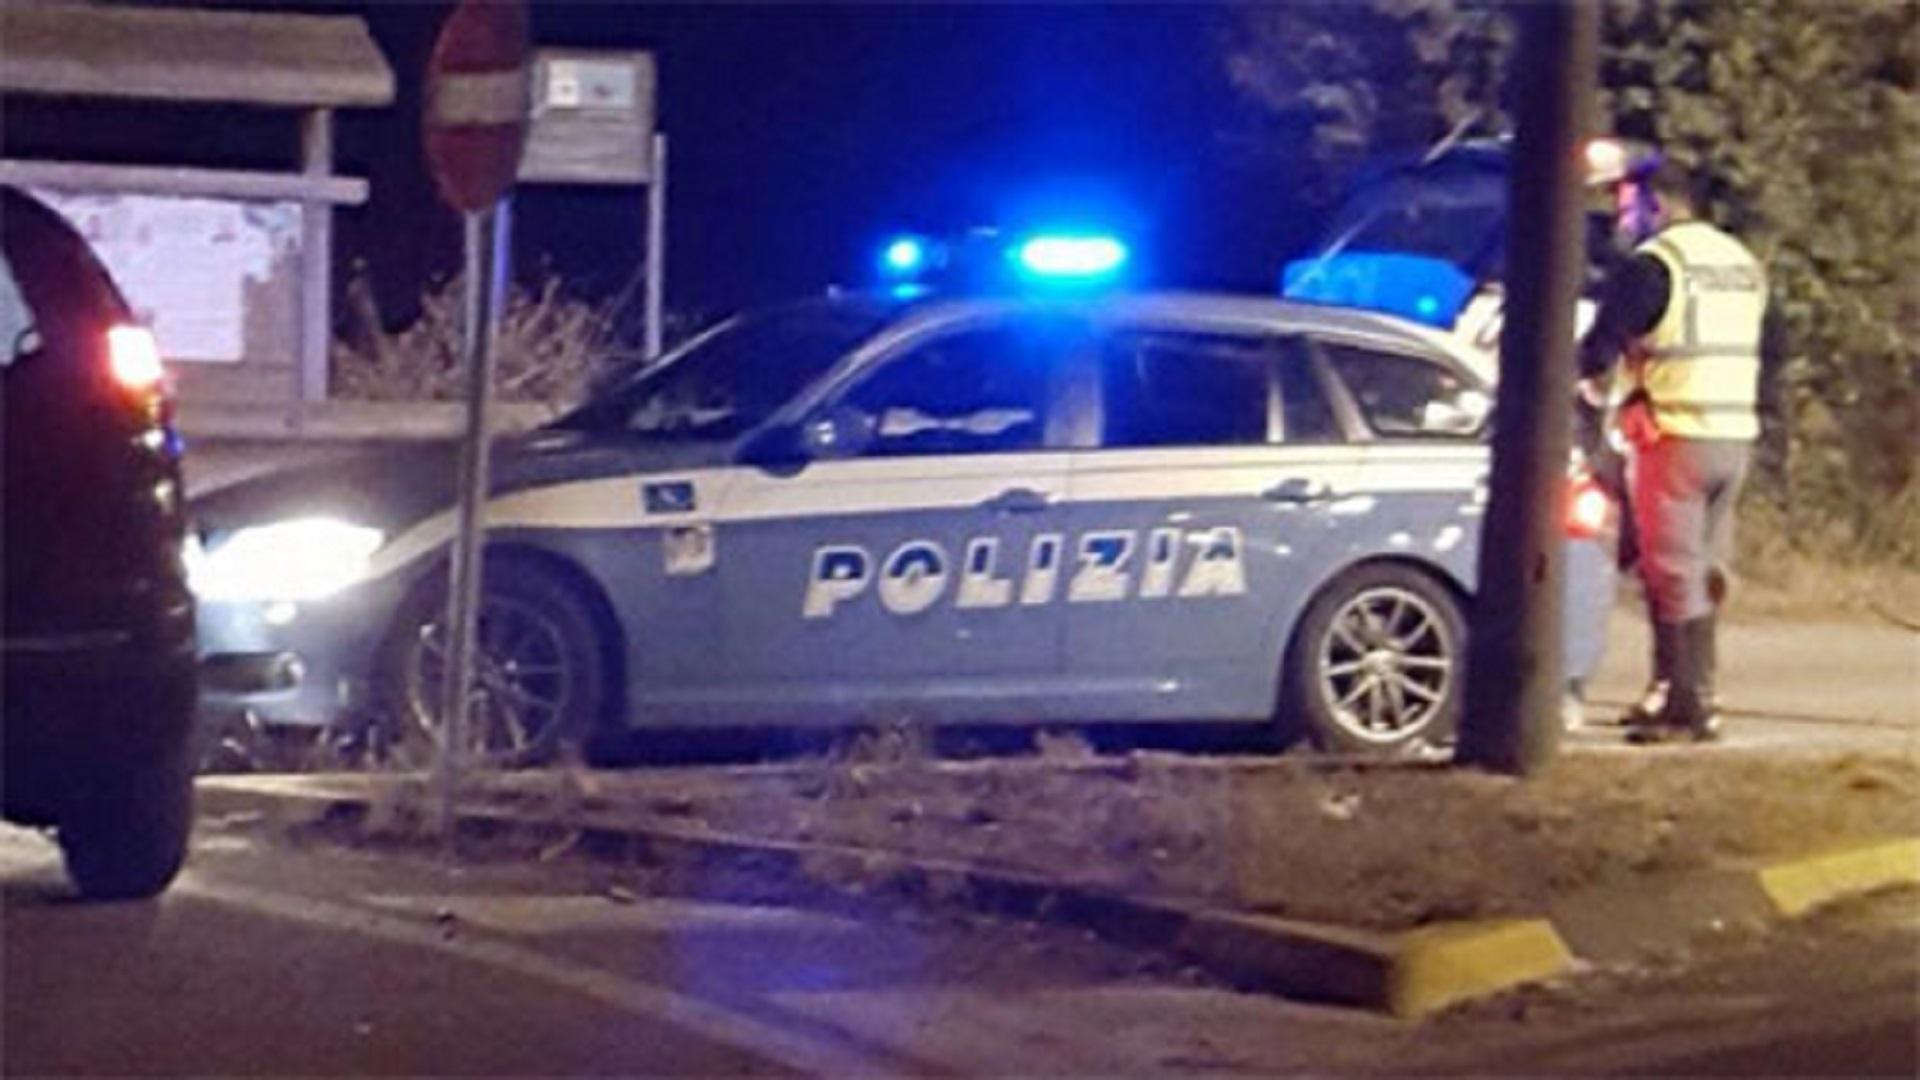 Polizia_Stradale_lampeggiante_polstrada